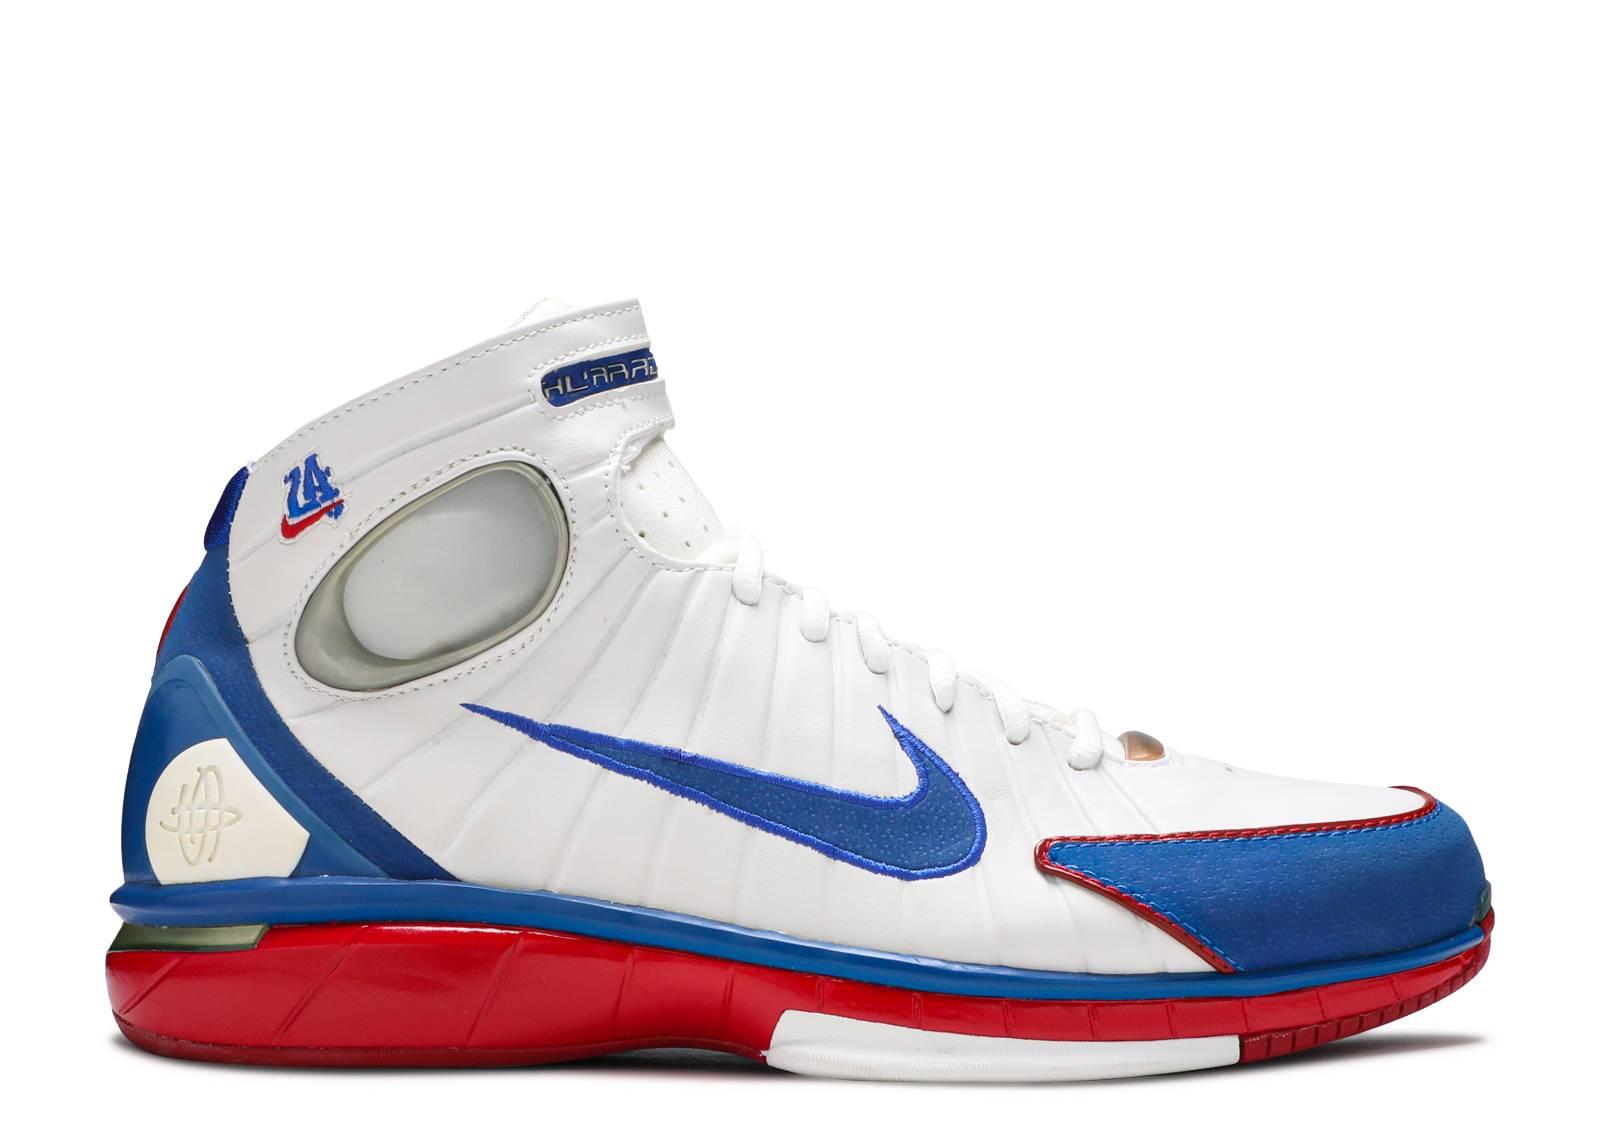 best service 6da2f 23437 ... Silver-Pro Purple Men Shoes H8023193 - Men Nike Air Zoom Huarache 2K4  (WhiteWhiteHot air zoom huarache 2k4 . ...